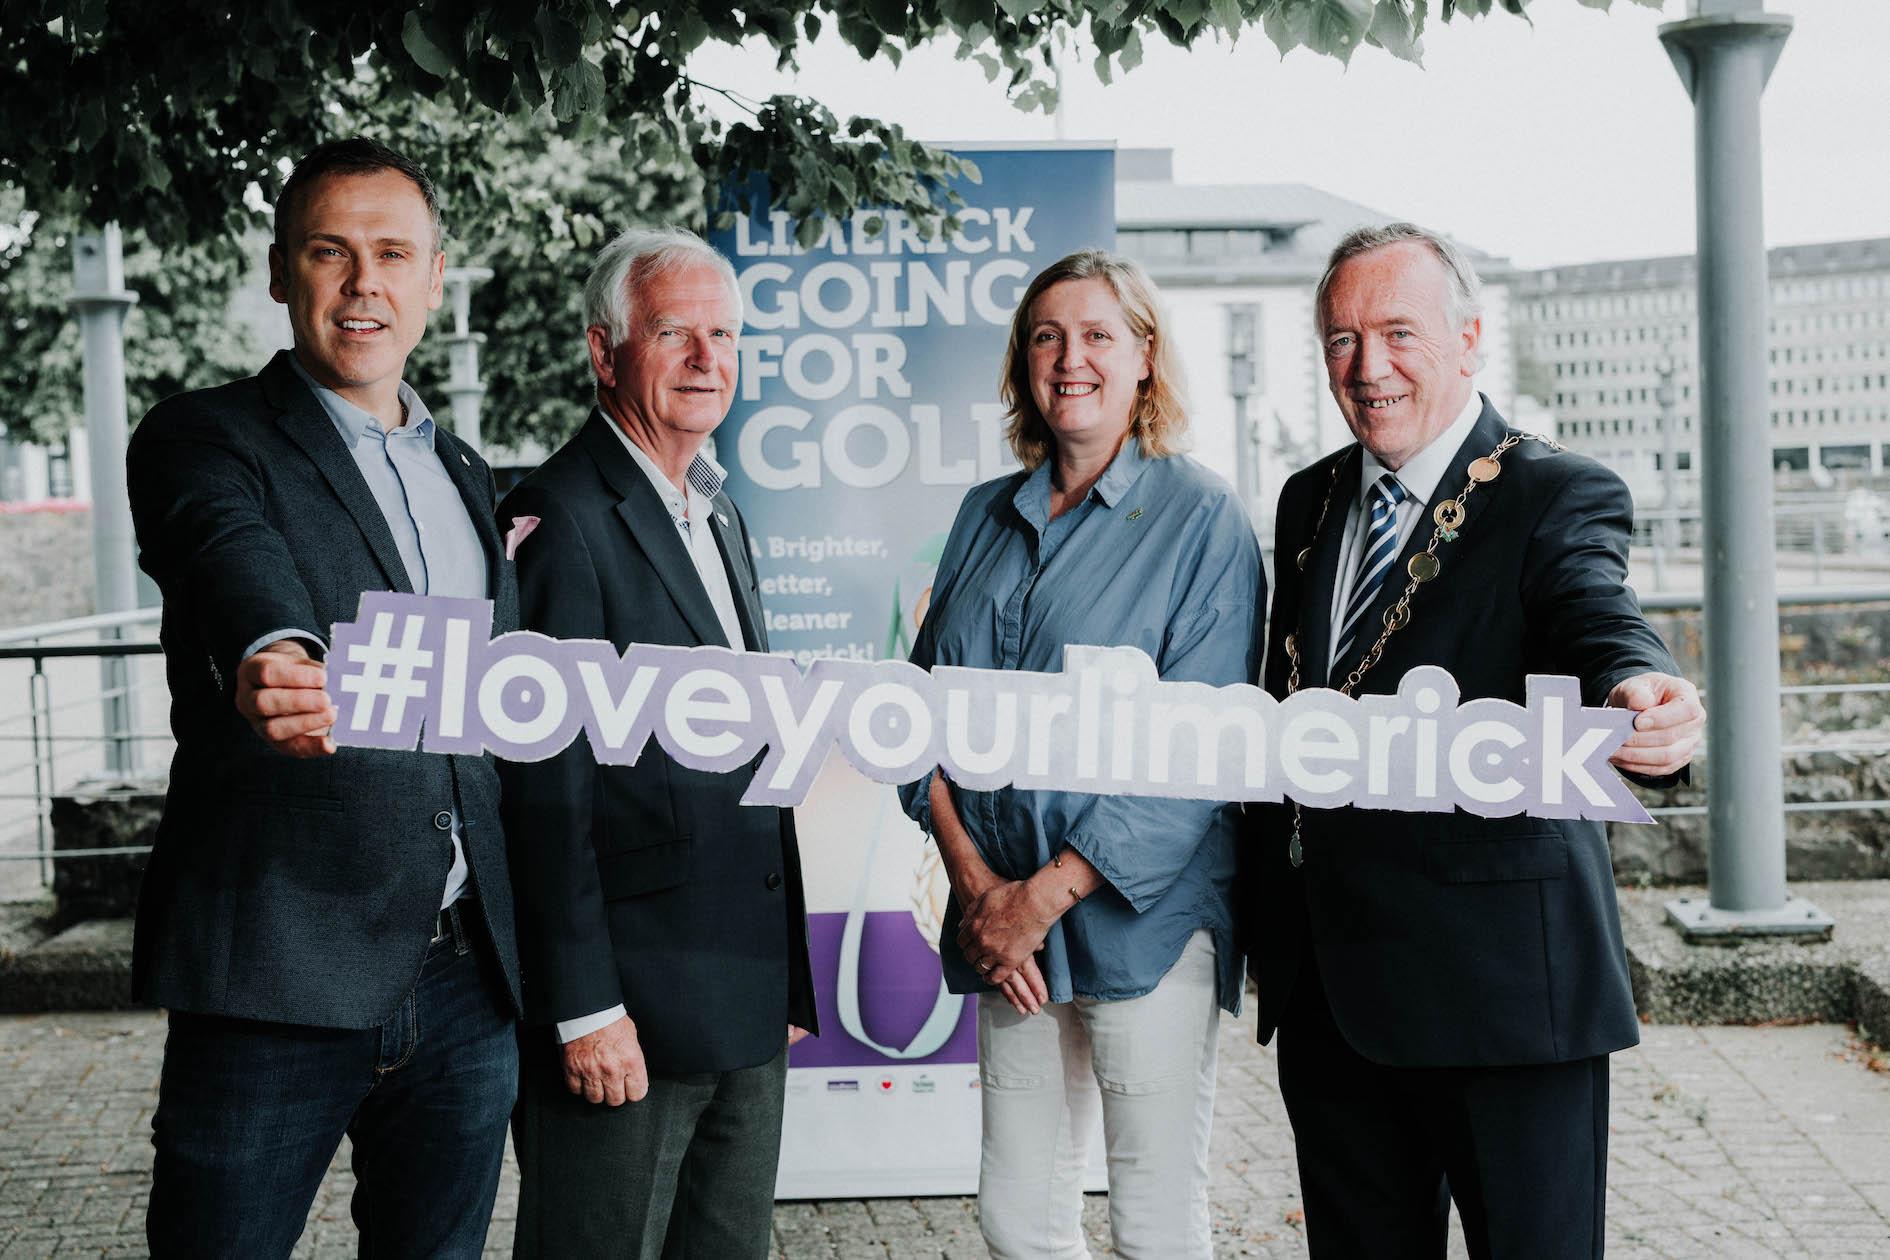 Limerick Going for Gold 2017